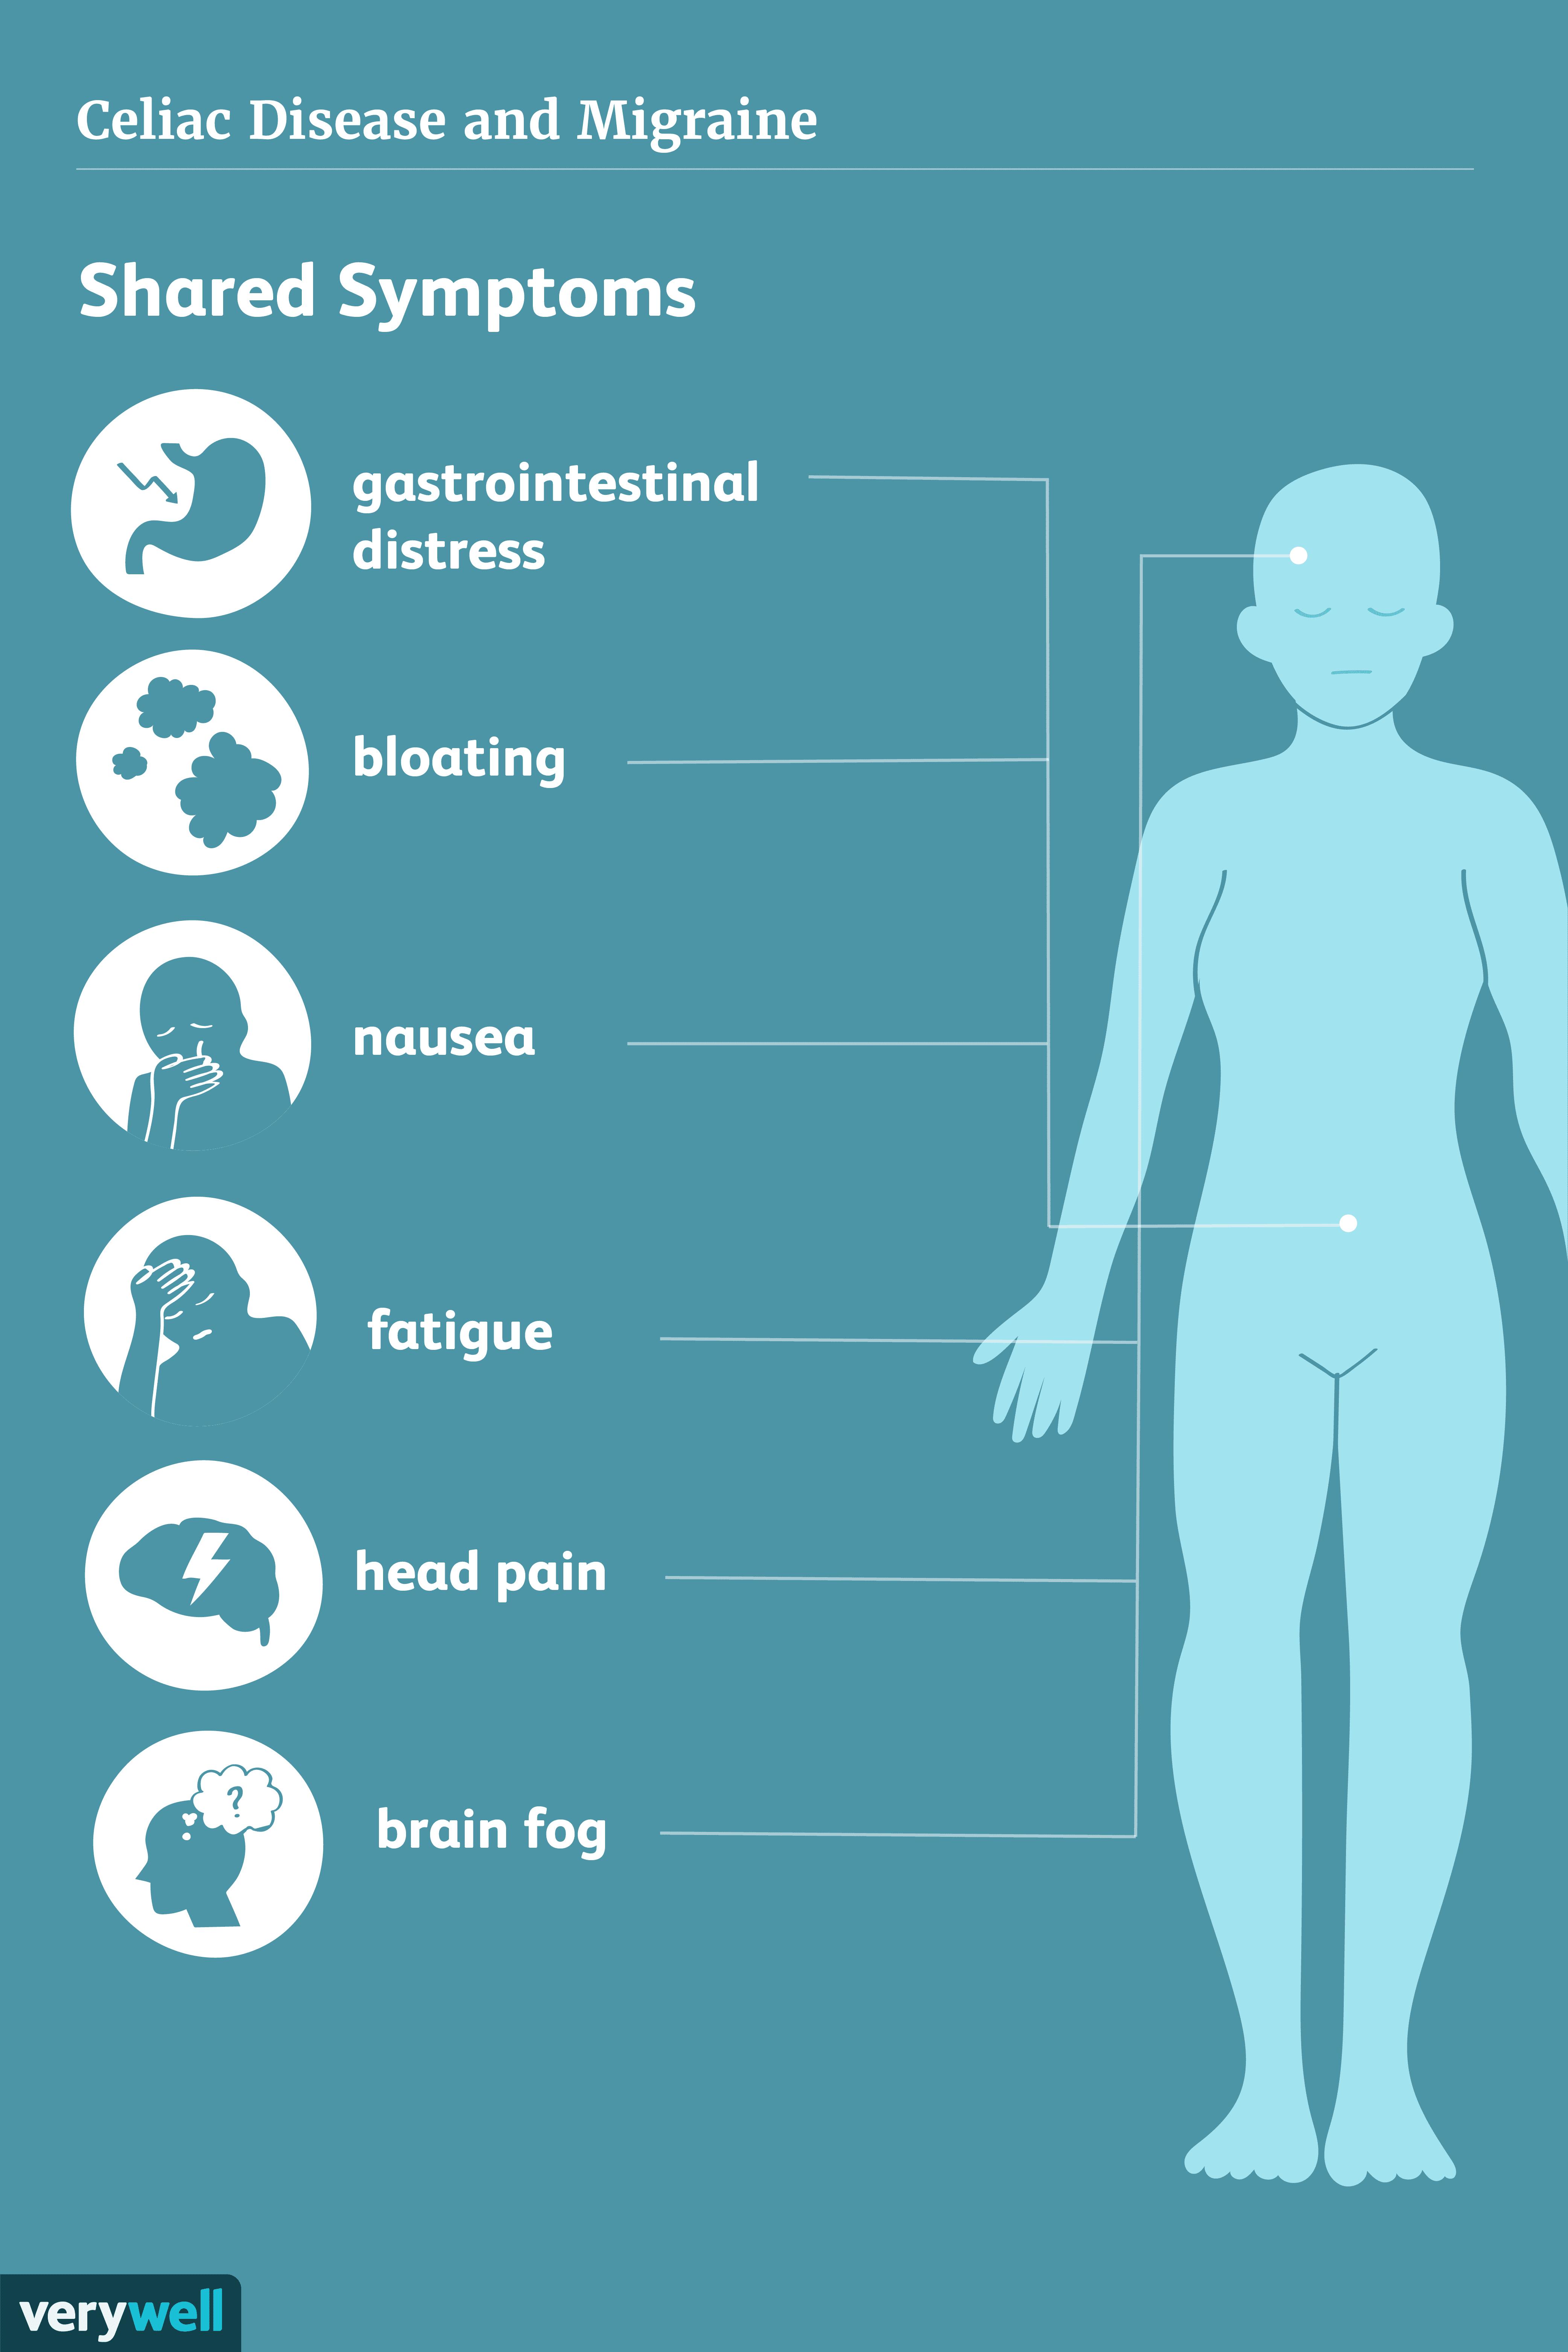 celiac and migraine shared symptoms